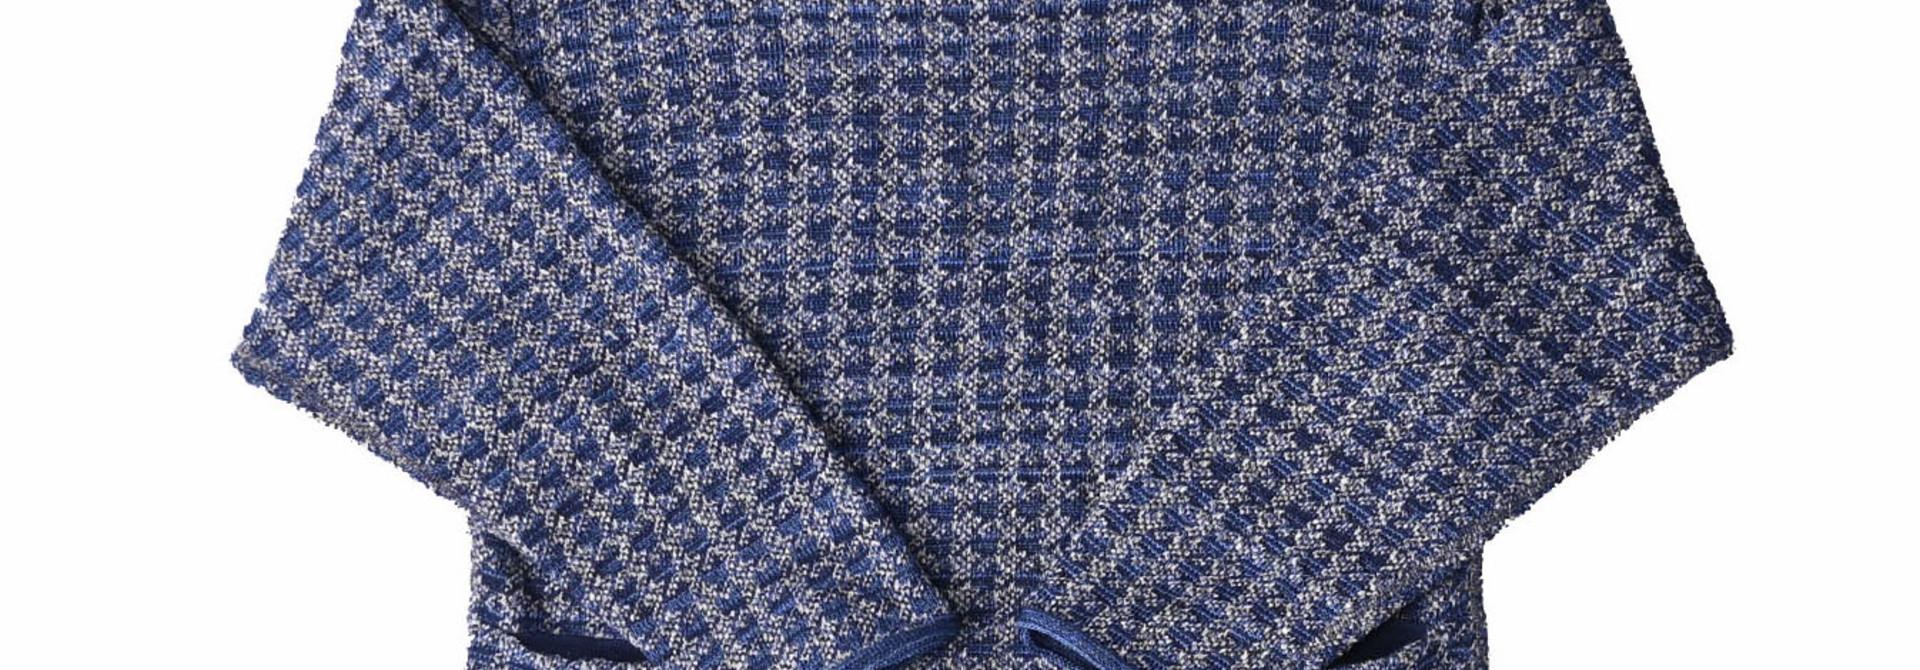 Indigo Knit Jacquard 908 Umahiko Sweater